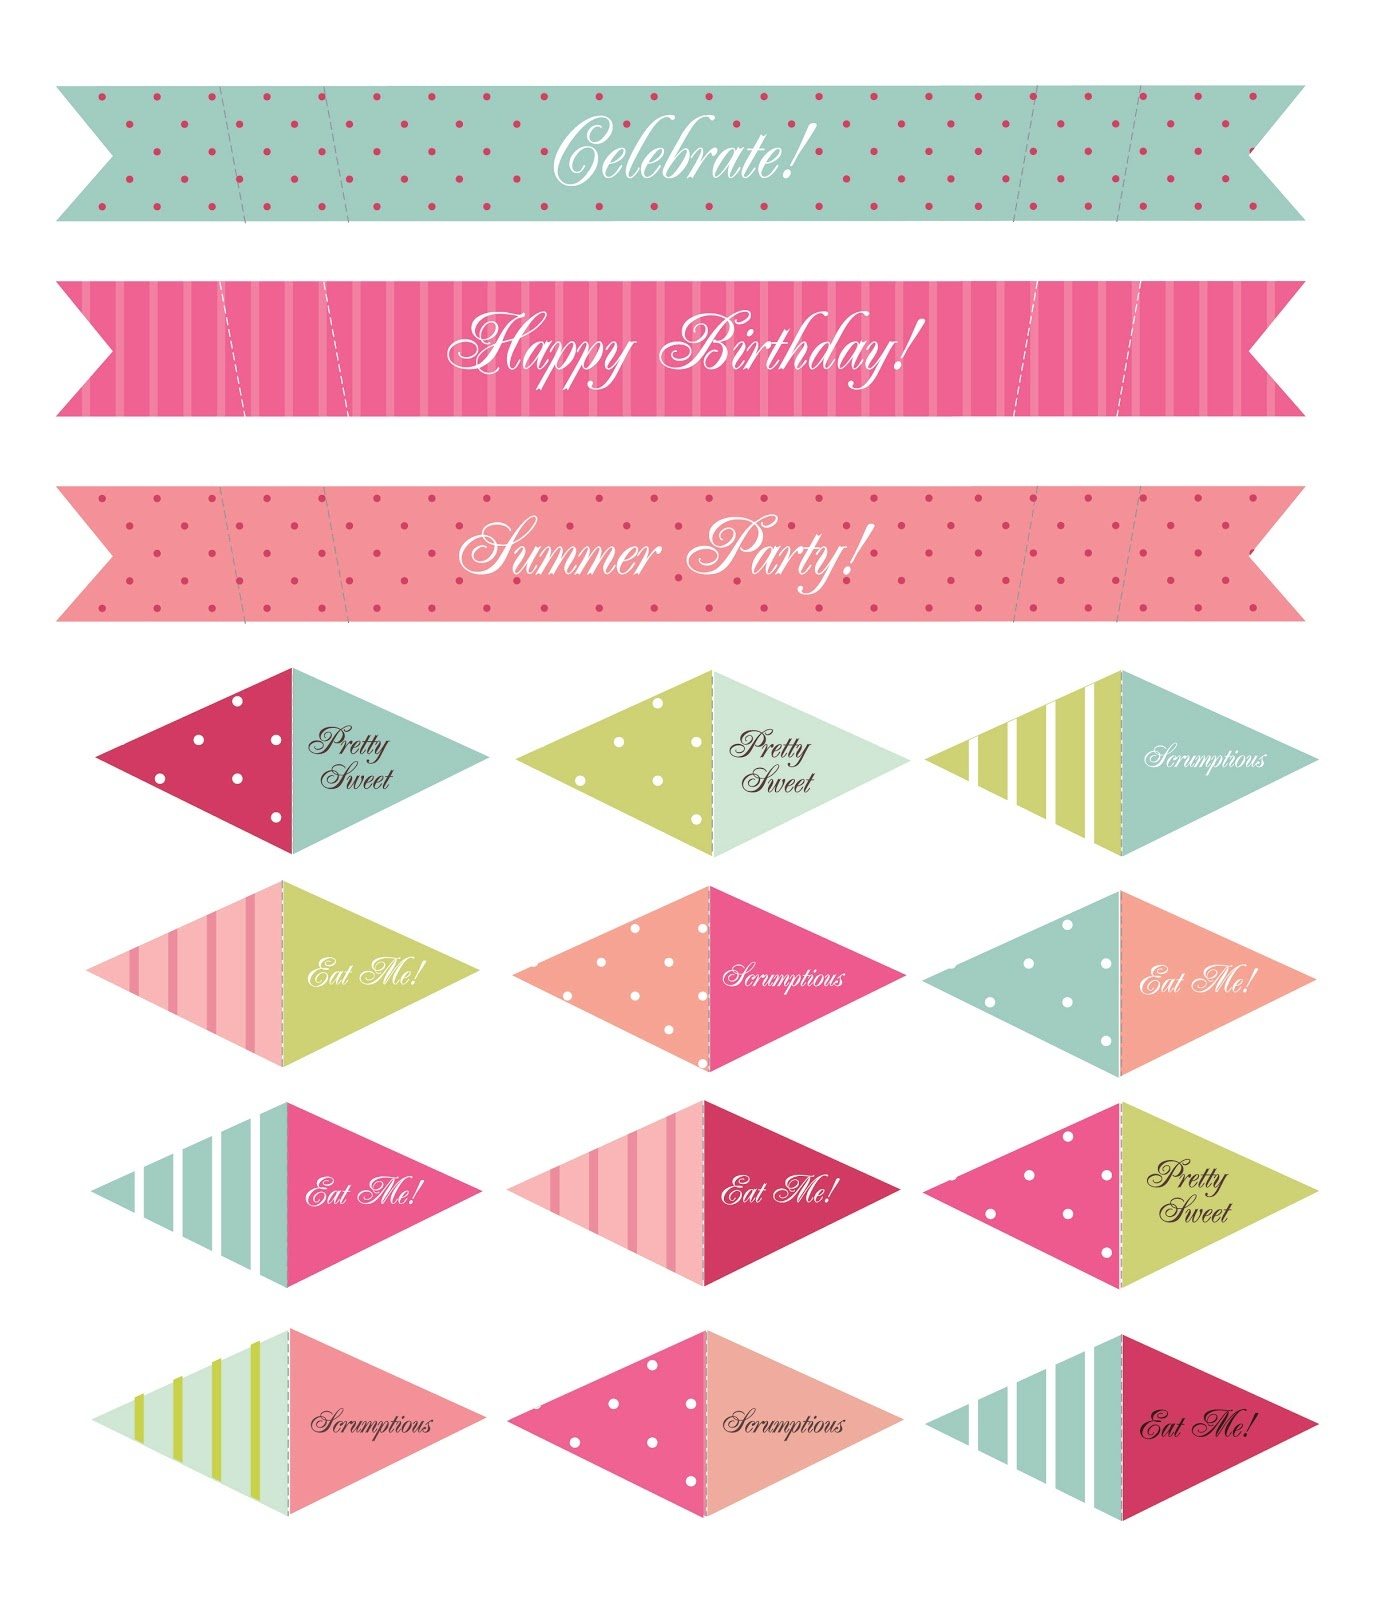 Katie Elliott Designs: Make Your Own - Free Printable Cake Bunting Template